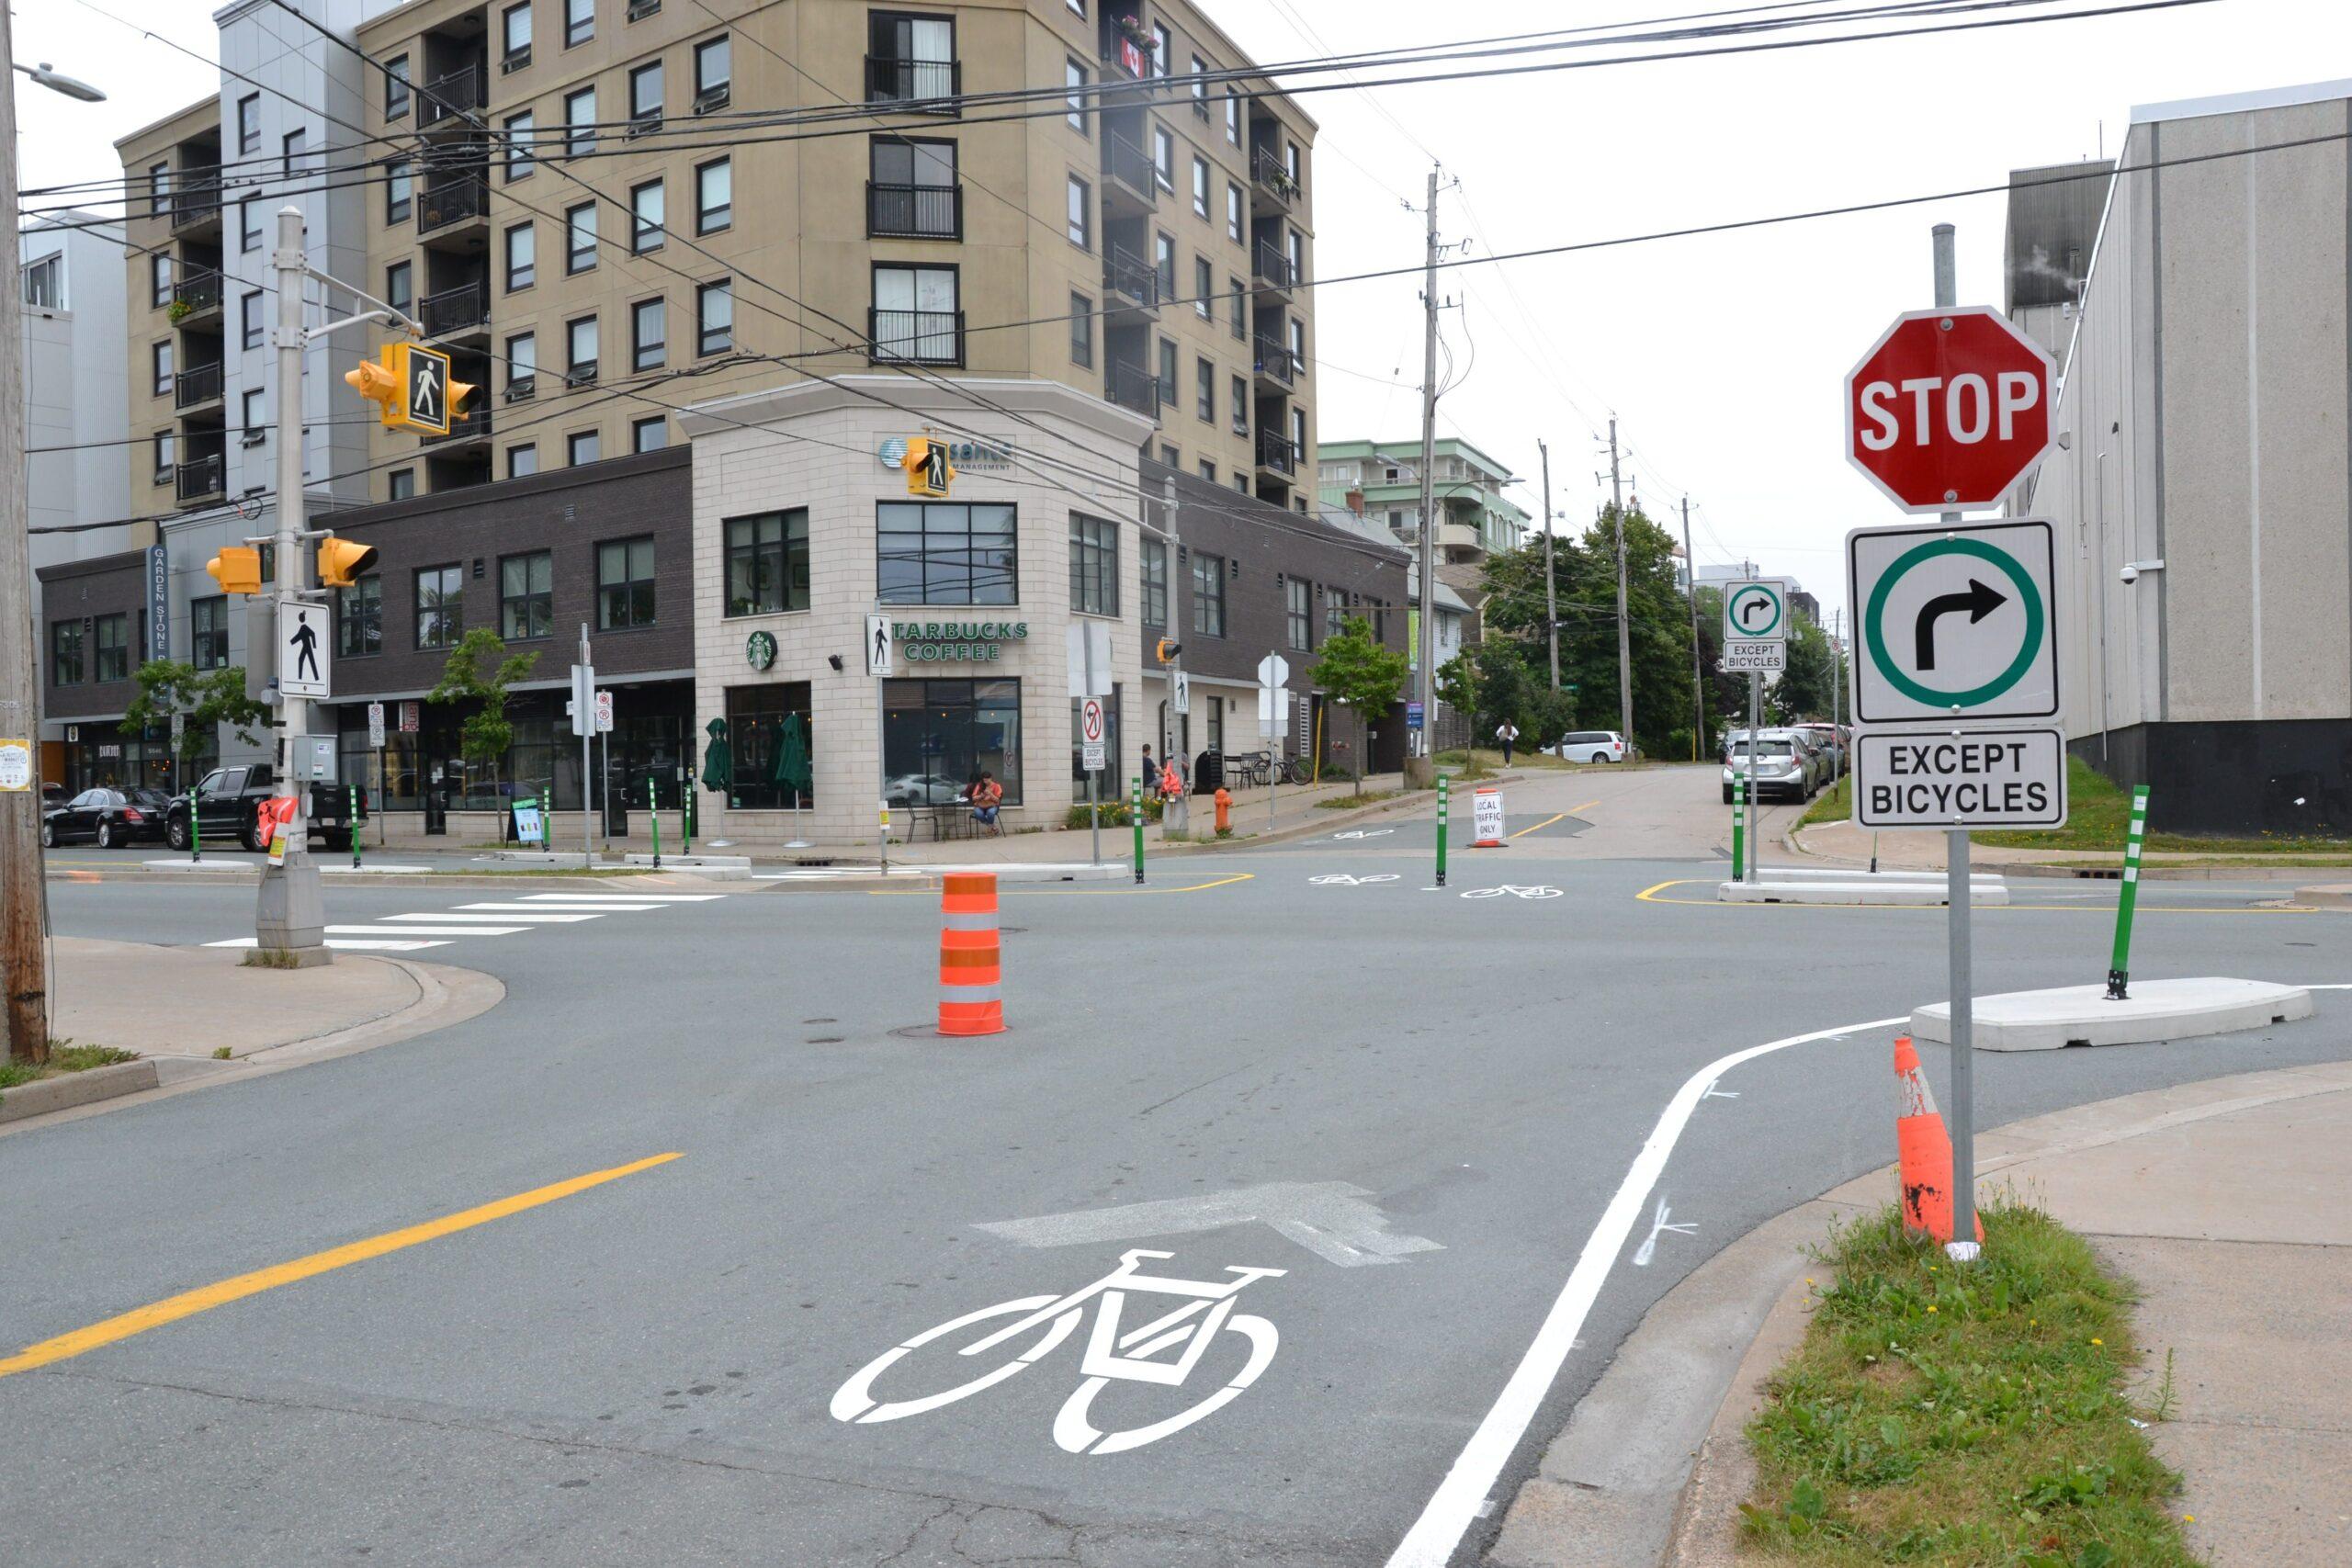 Bike lane with traffic cone